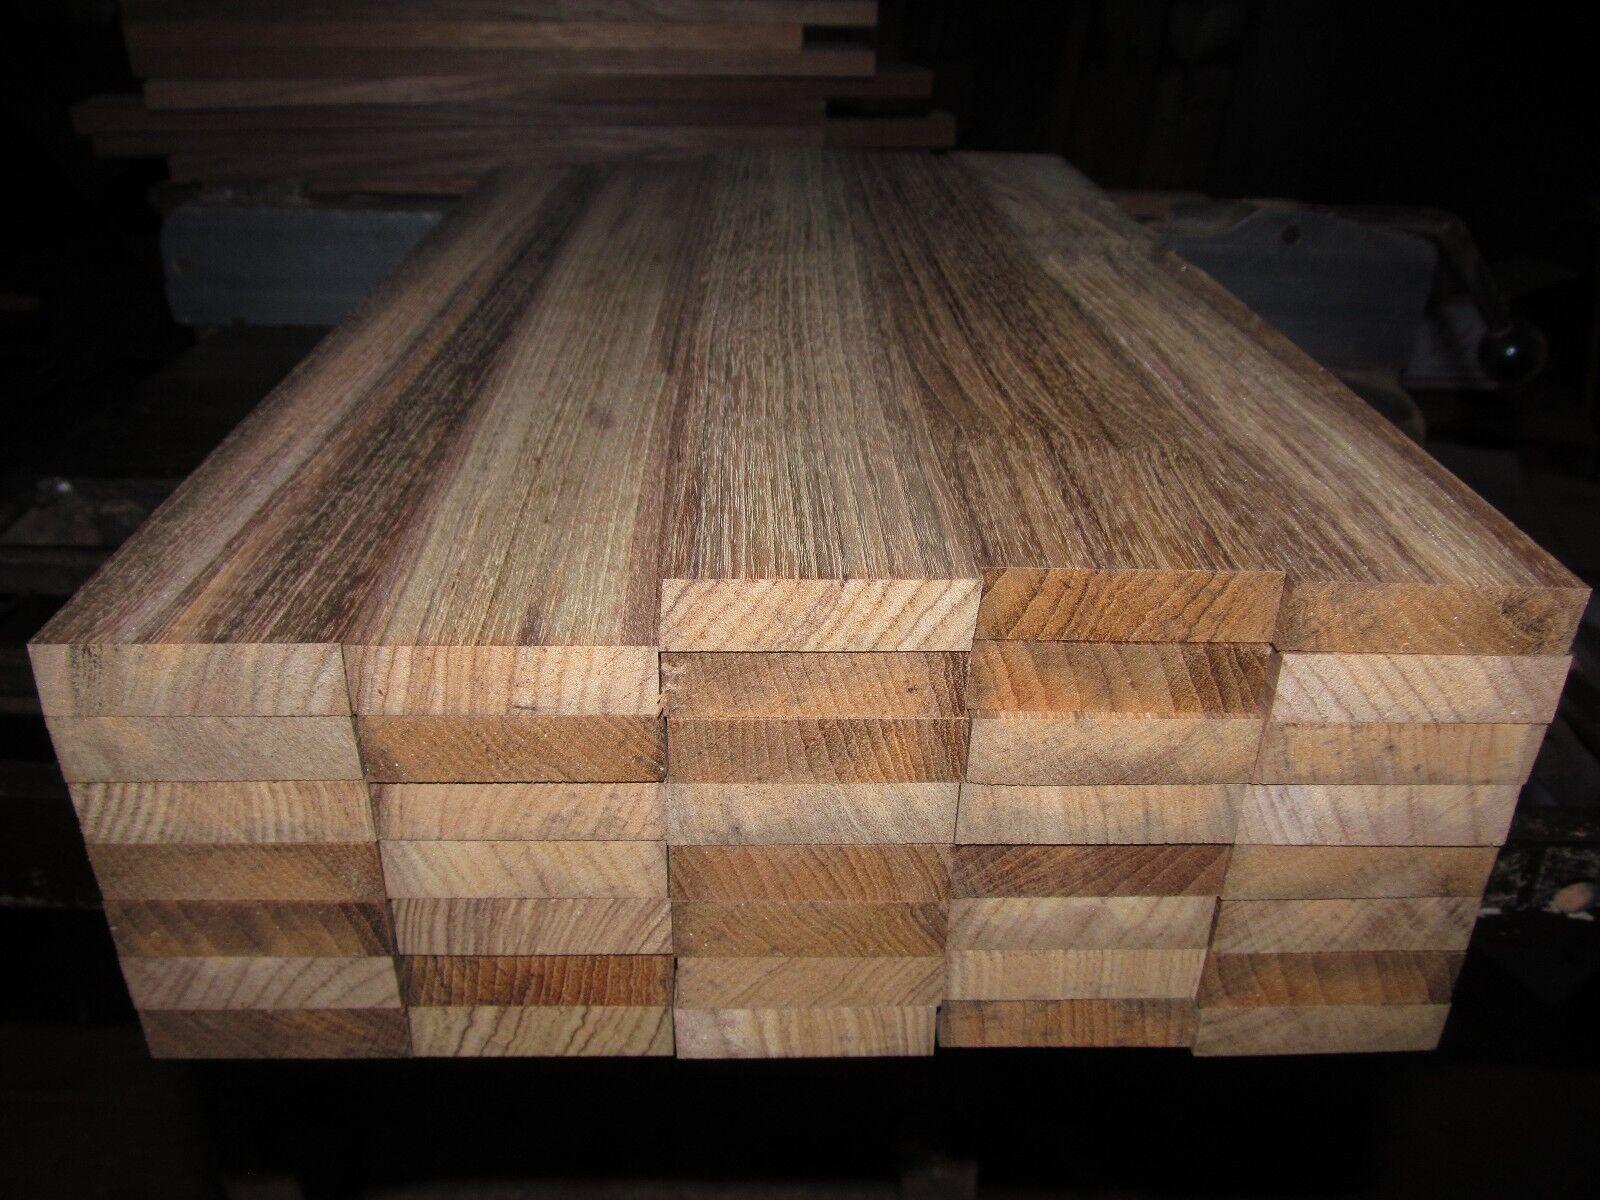 "Exotic Wood Premium Marine Teak Lumber  2"" X 10"" X 3/4""  NICE!"